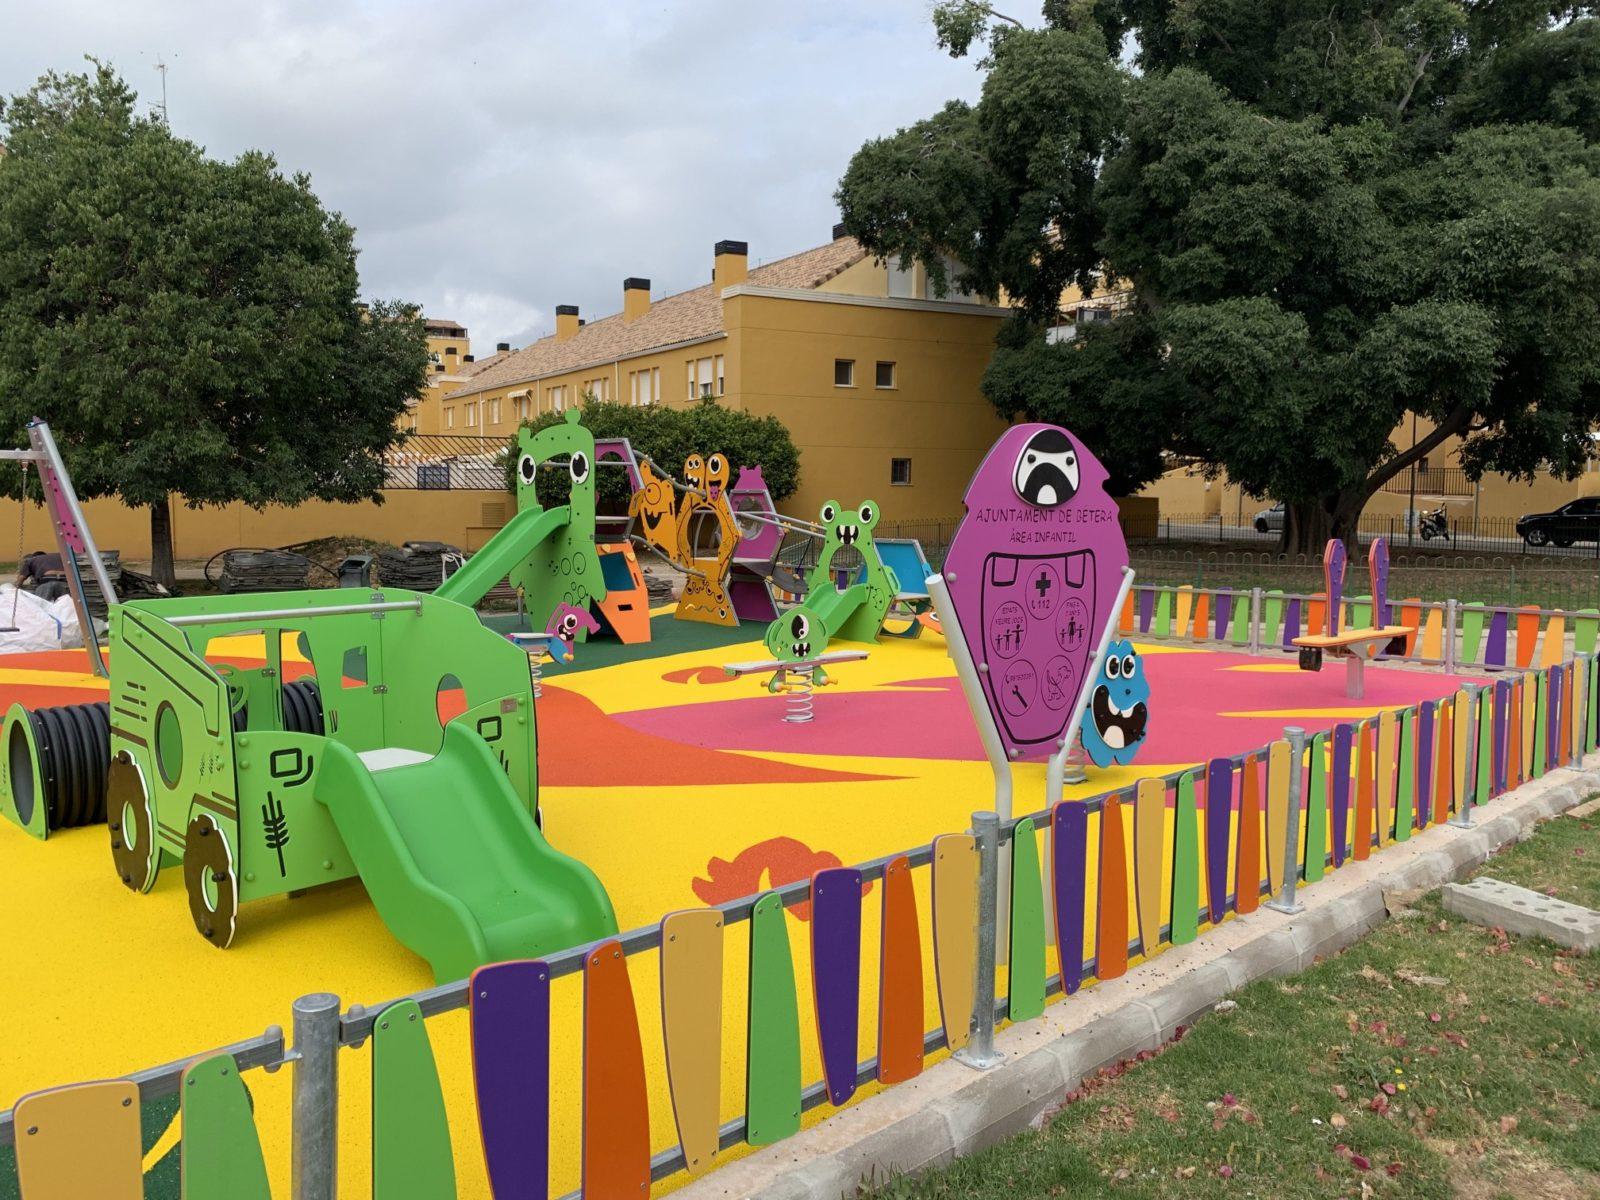 parque-infantil-polietileno-suelo-caucho-amortiguador